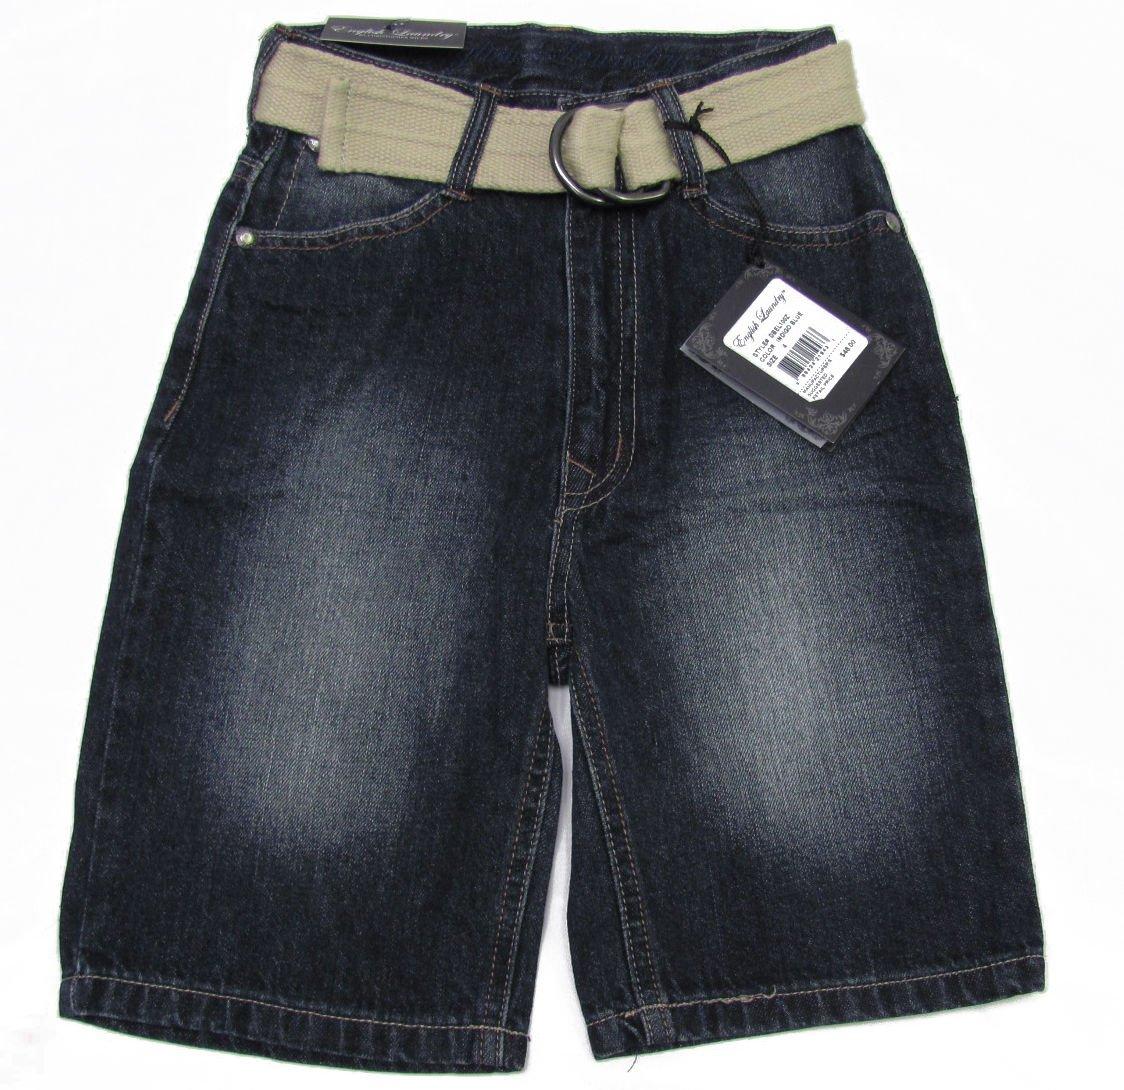 English Laundry Boys size 6 Dark Blue Jean Shorts with Belt New